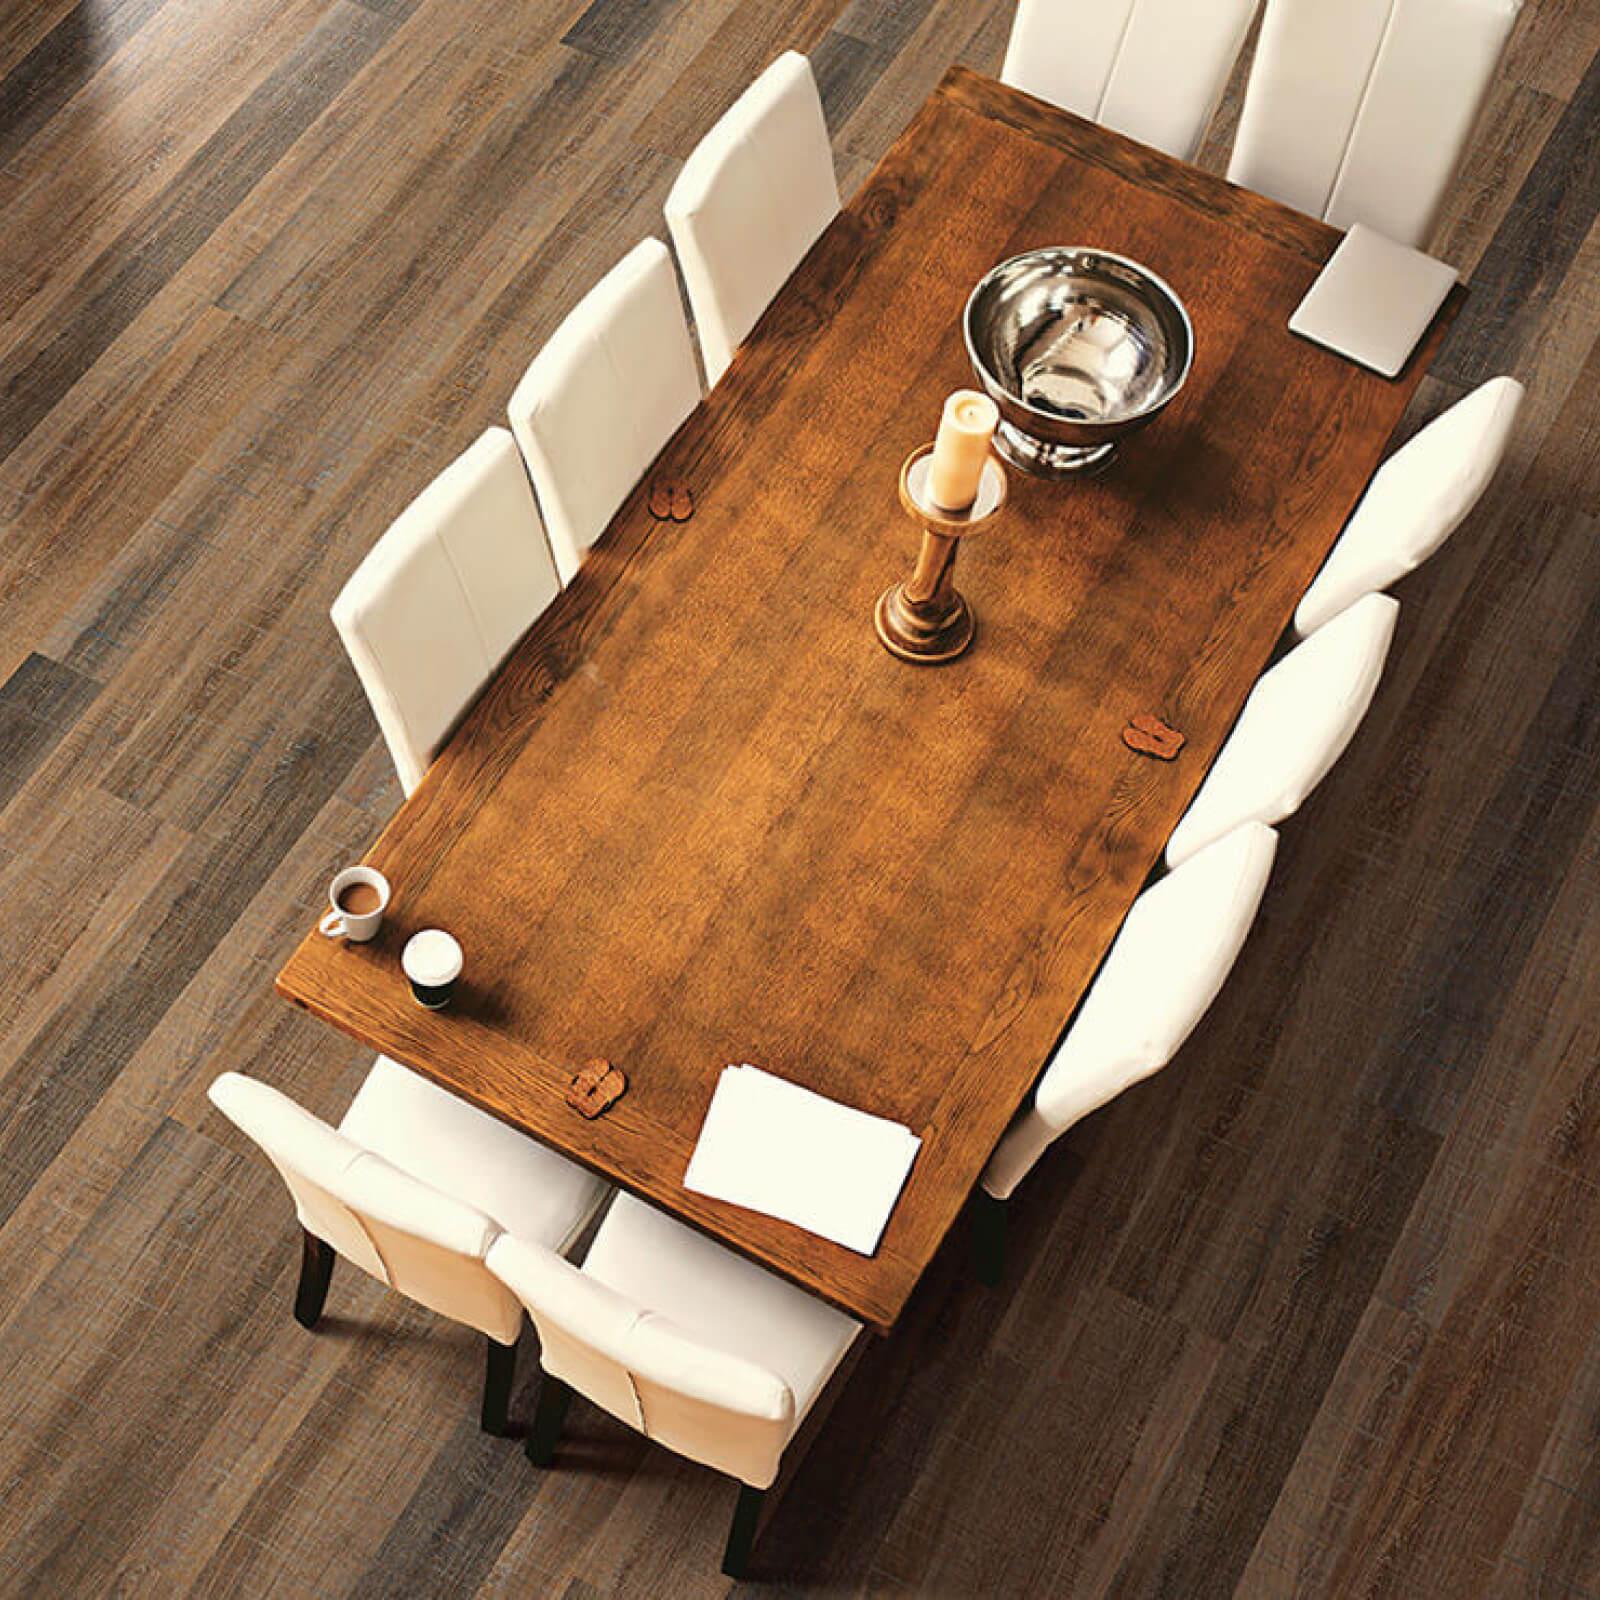 Dining Table | McSwain Carpet & Floors